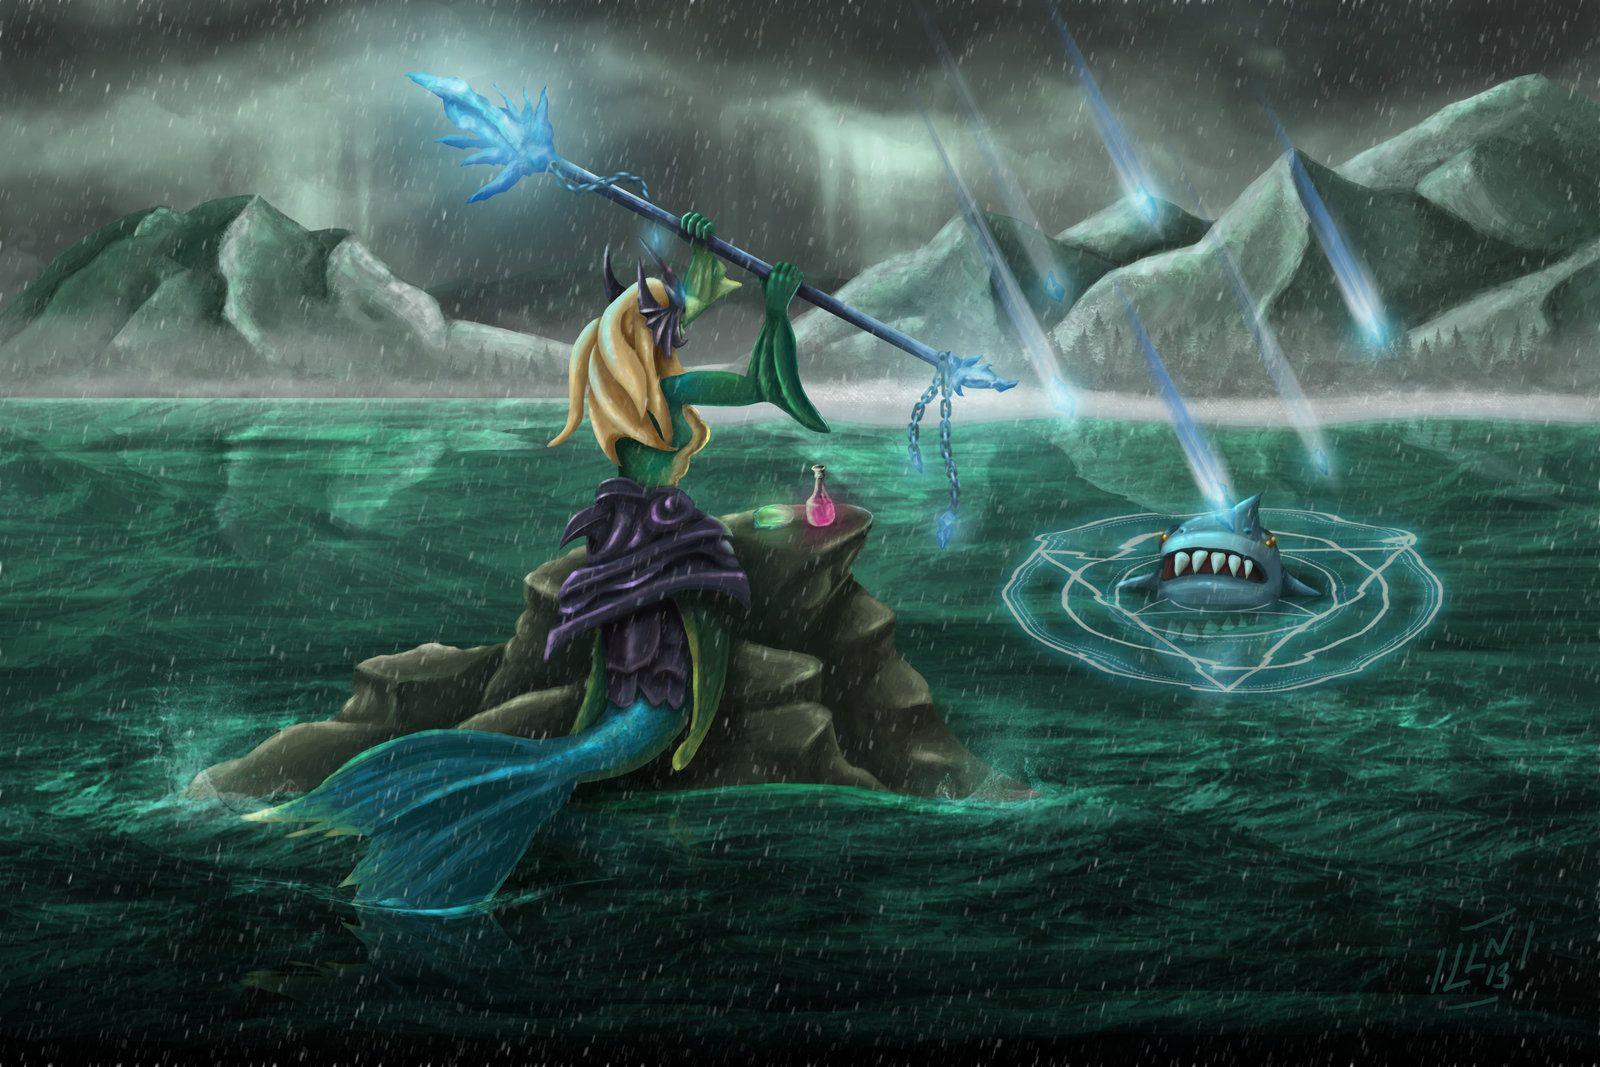 League Of Legends Nami Wallpapers Wallpaper Cave